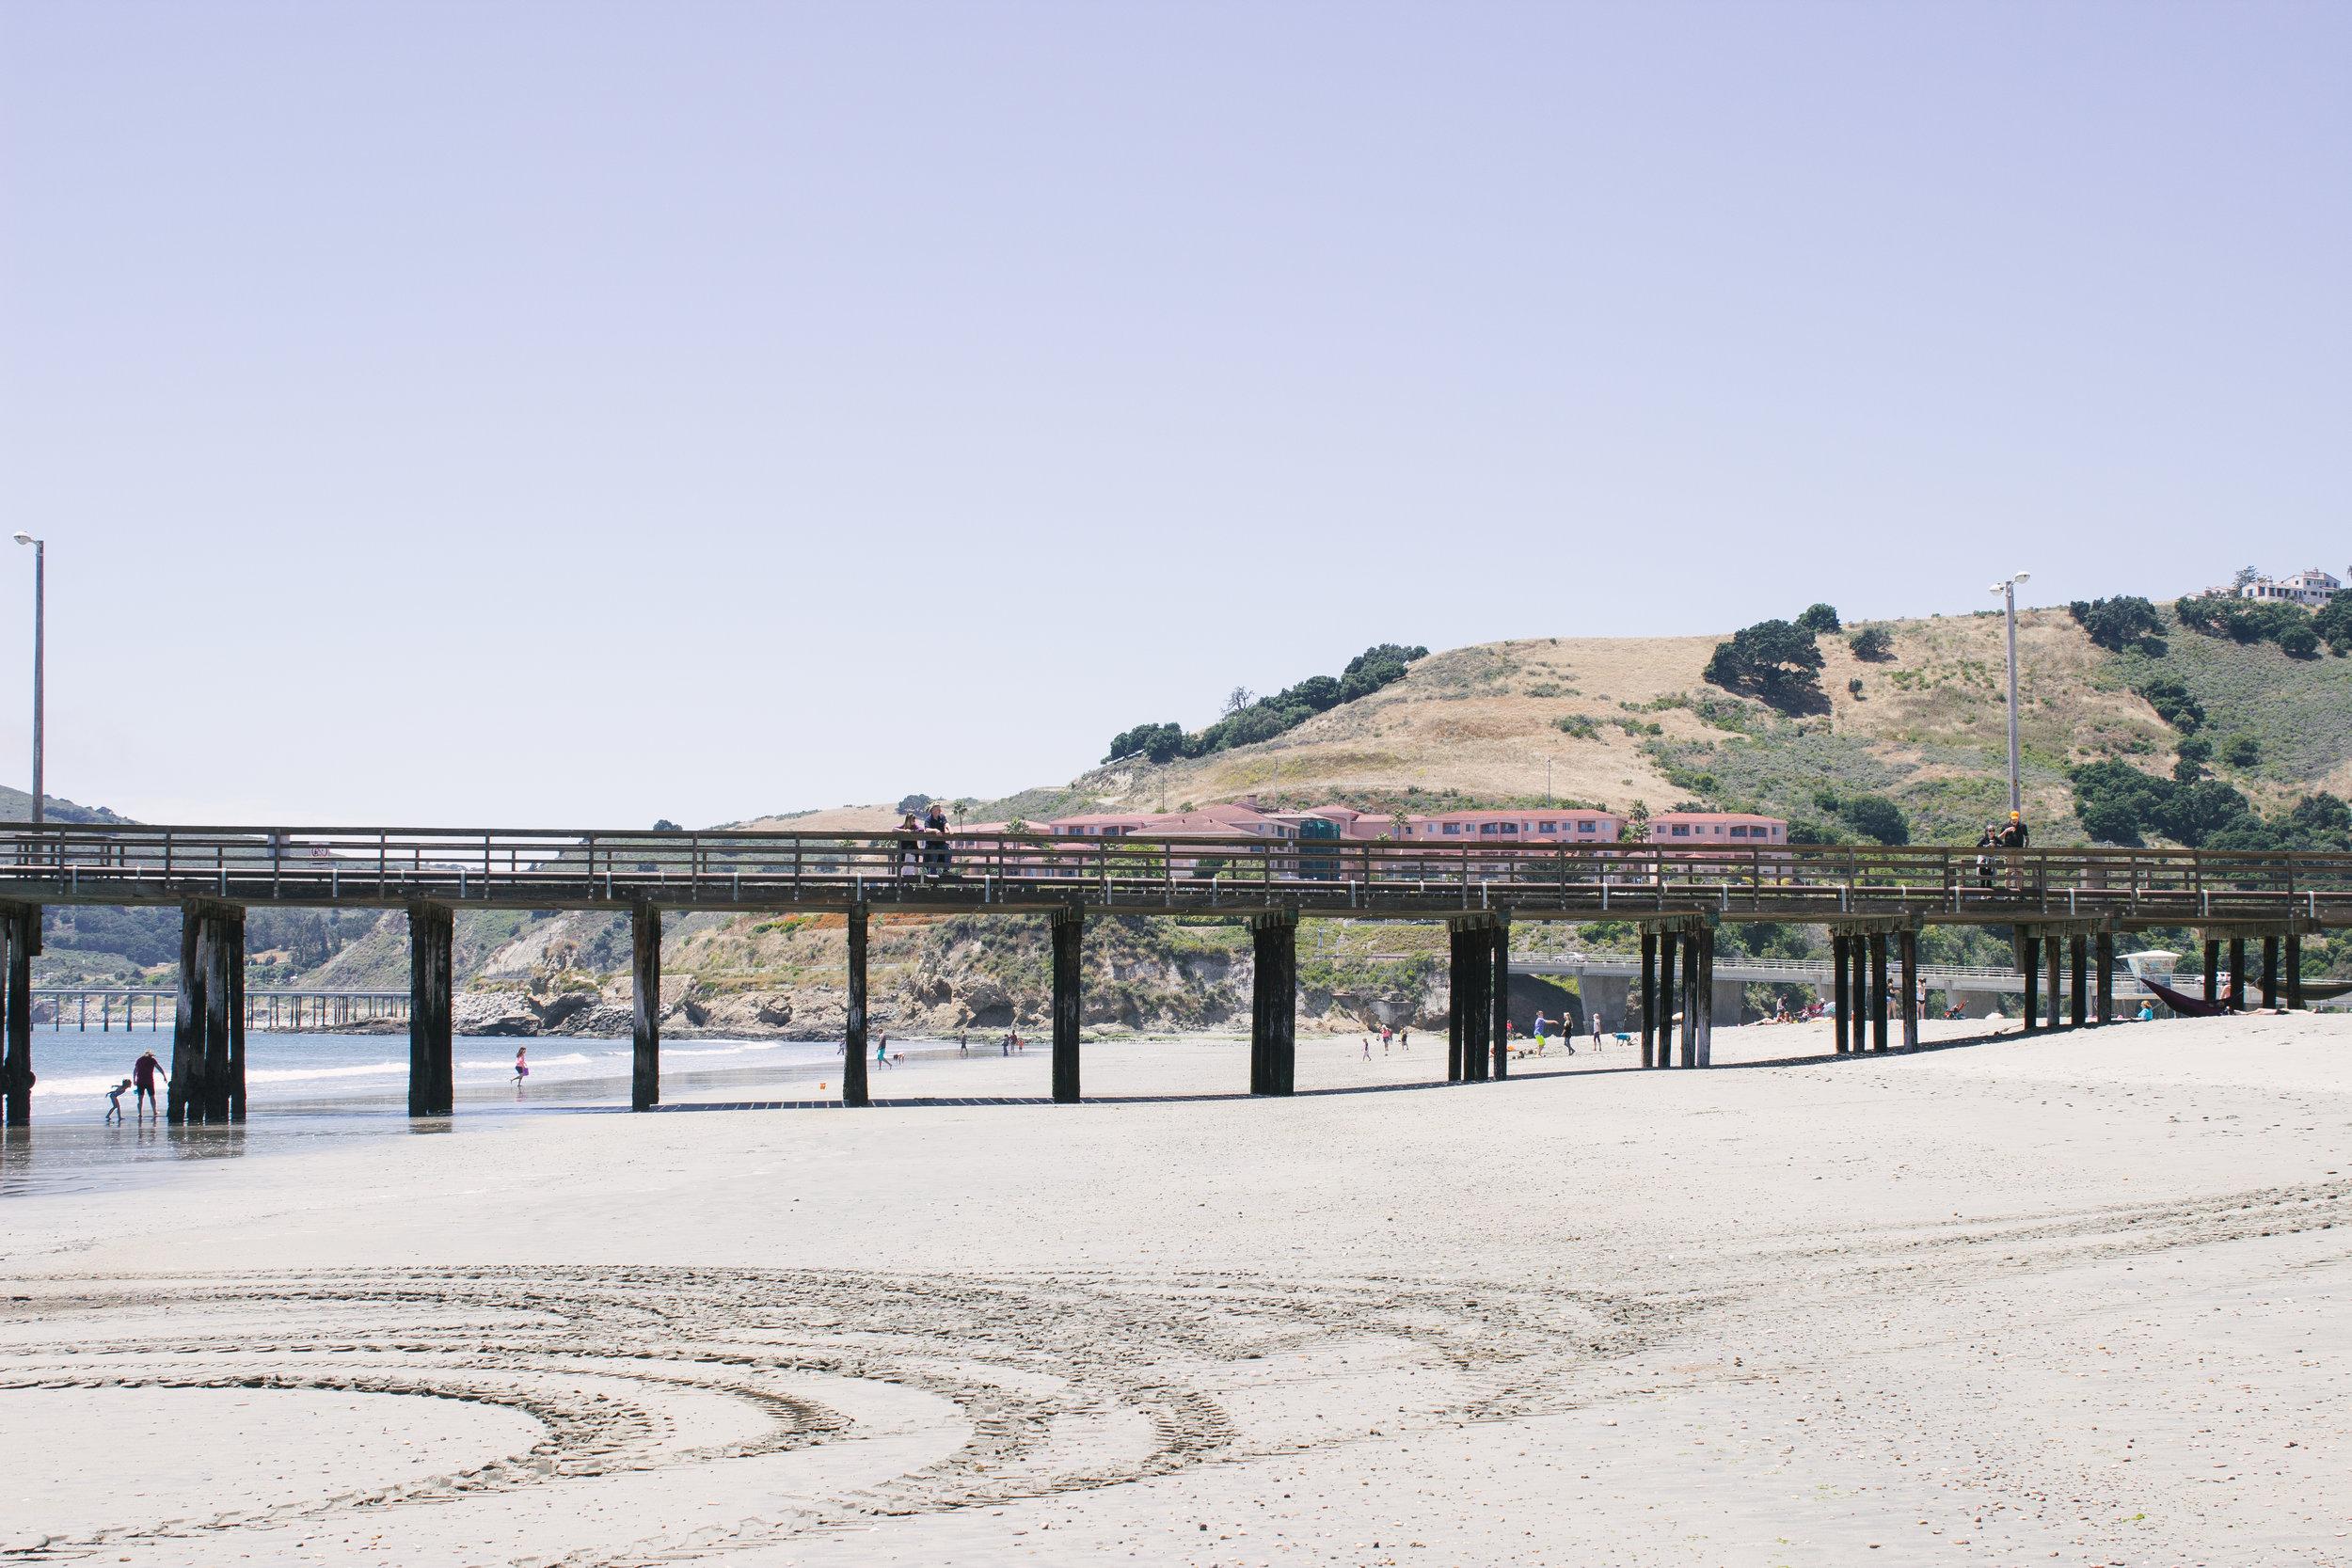 san_luis_obispo_central_coast_california-19.jpg